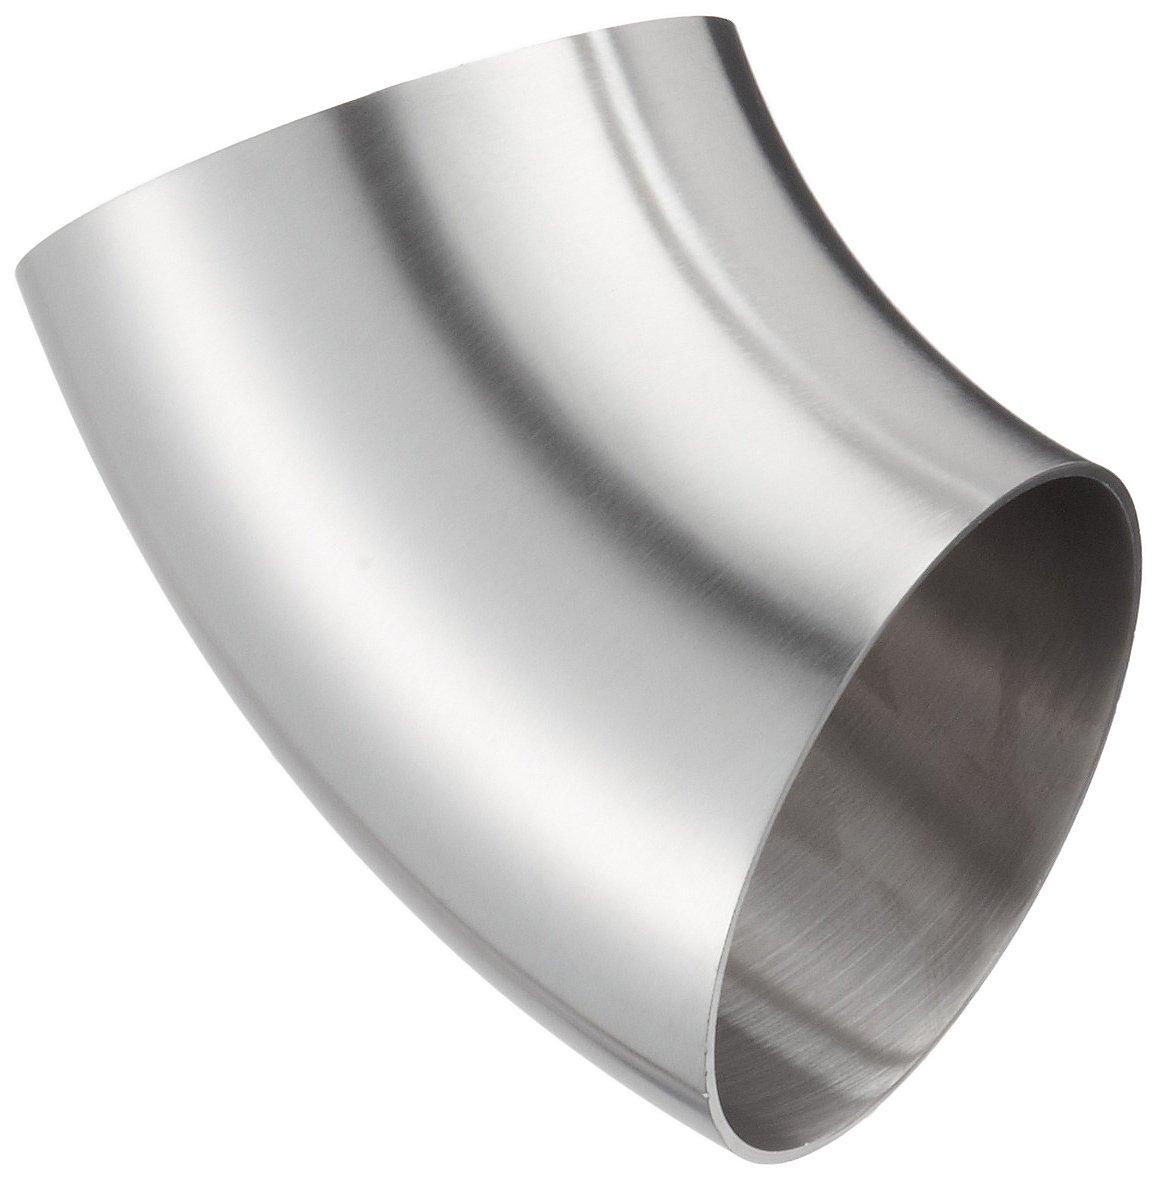 45 Degree Polished Weld Short Elbow Dixon B2WK-G300P Stainless Steel 304 Sanitary Fitting 3 Tube OD 3 Tube OD Dixon Valve /& Coupling